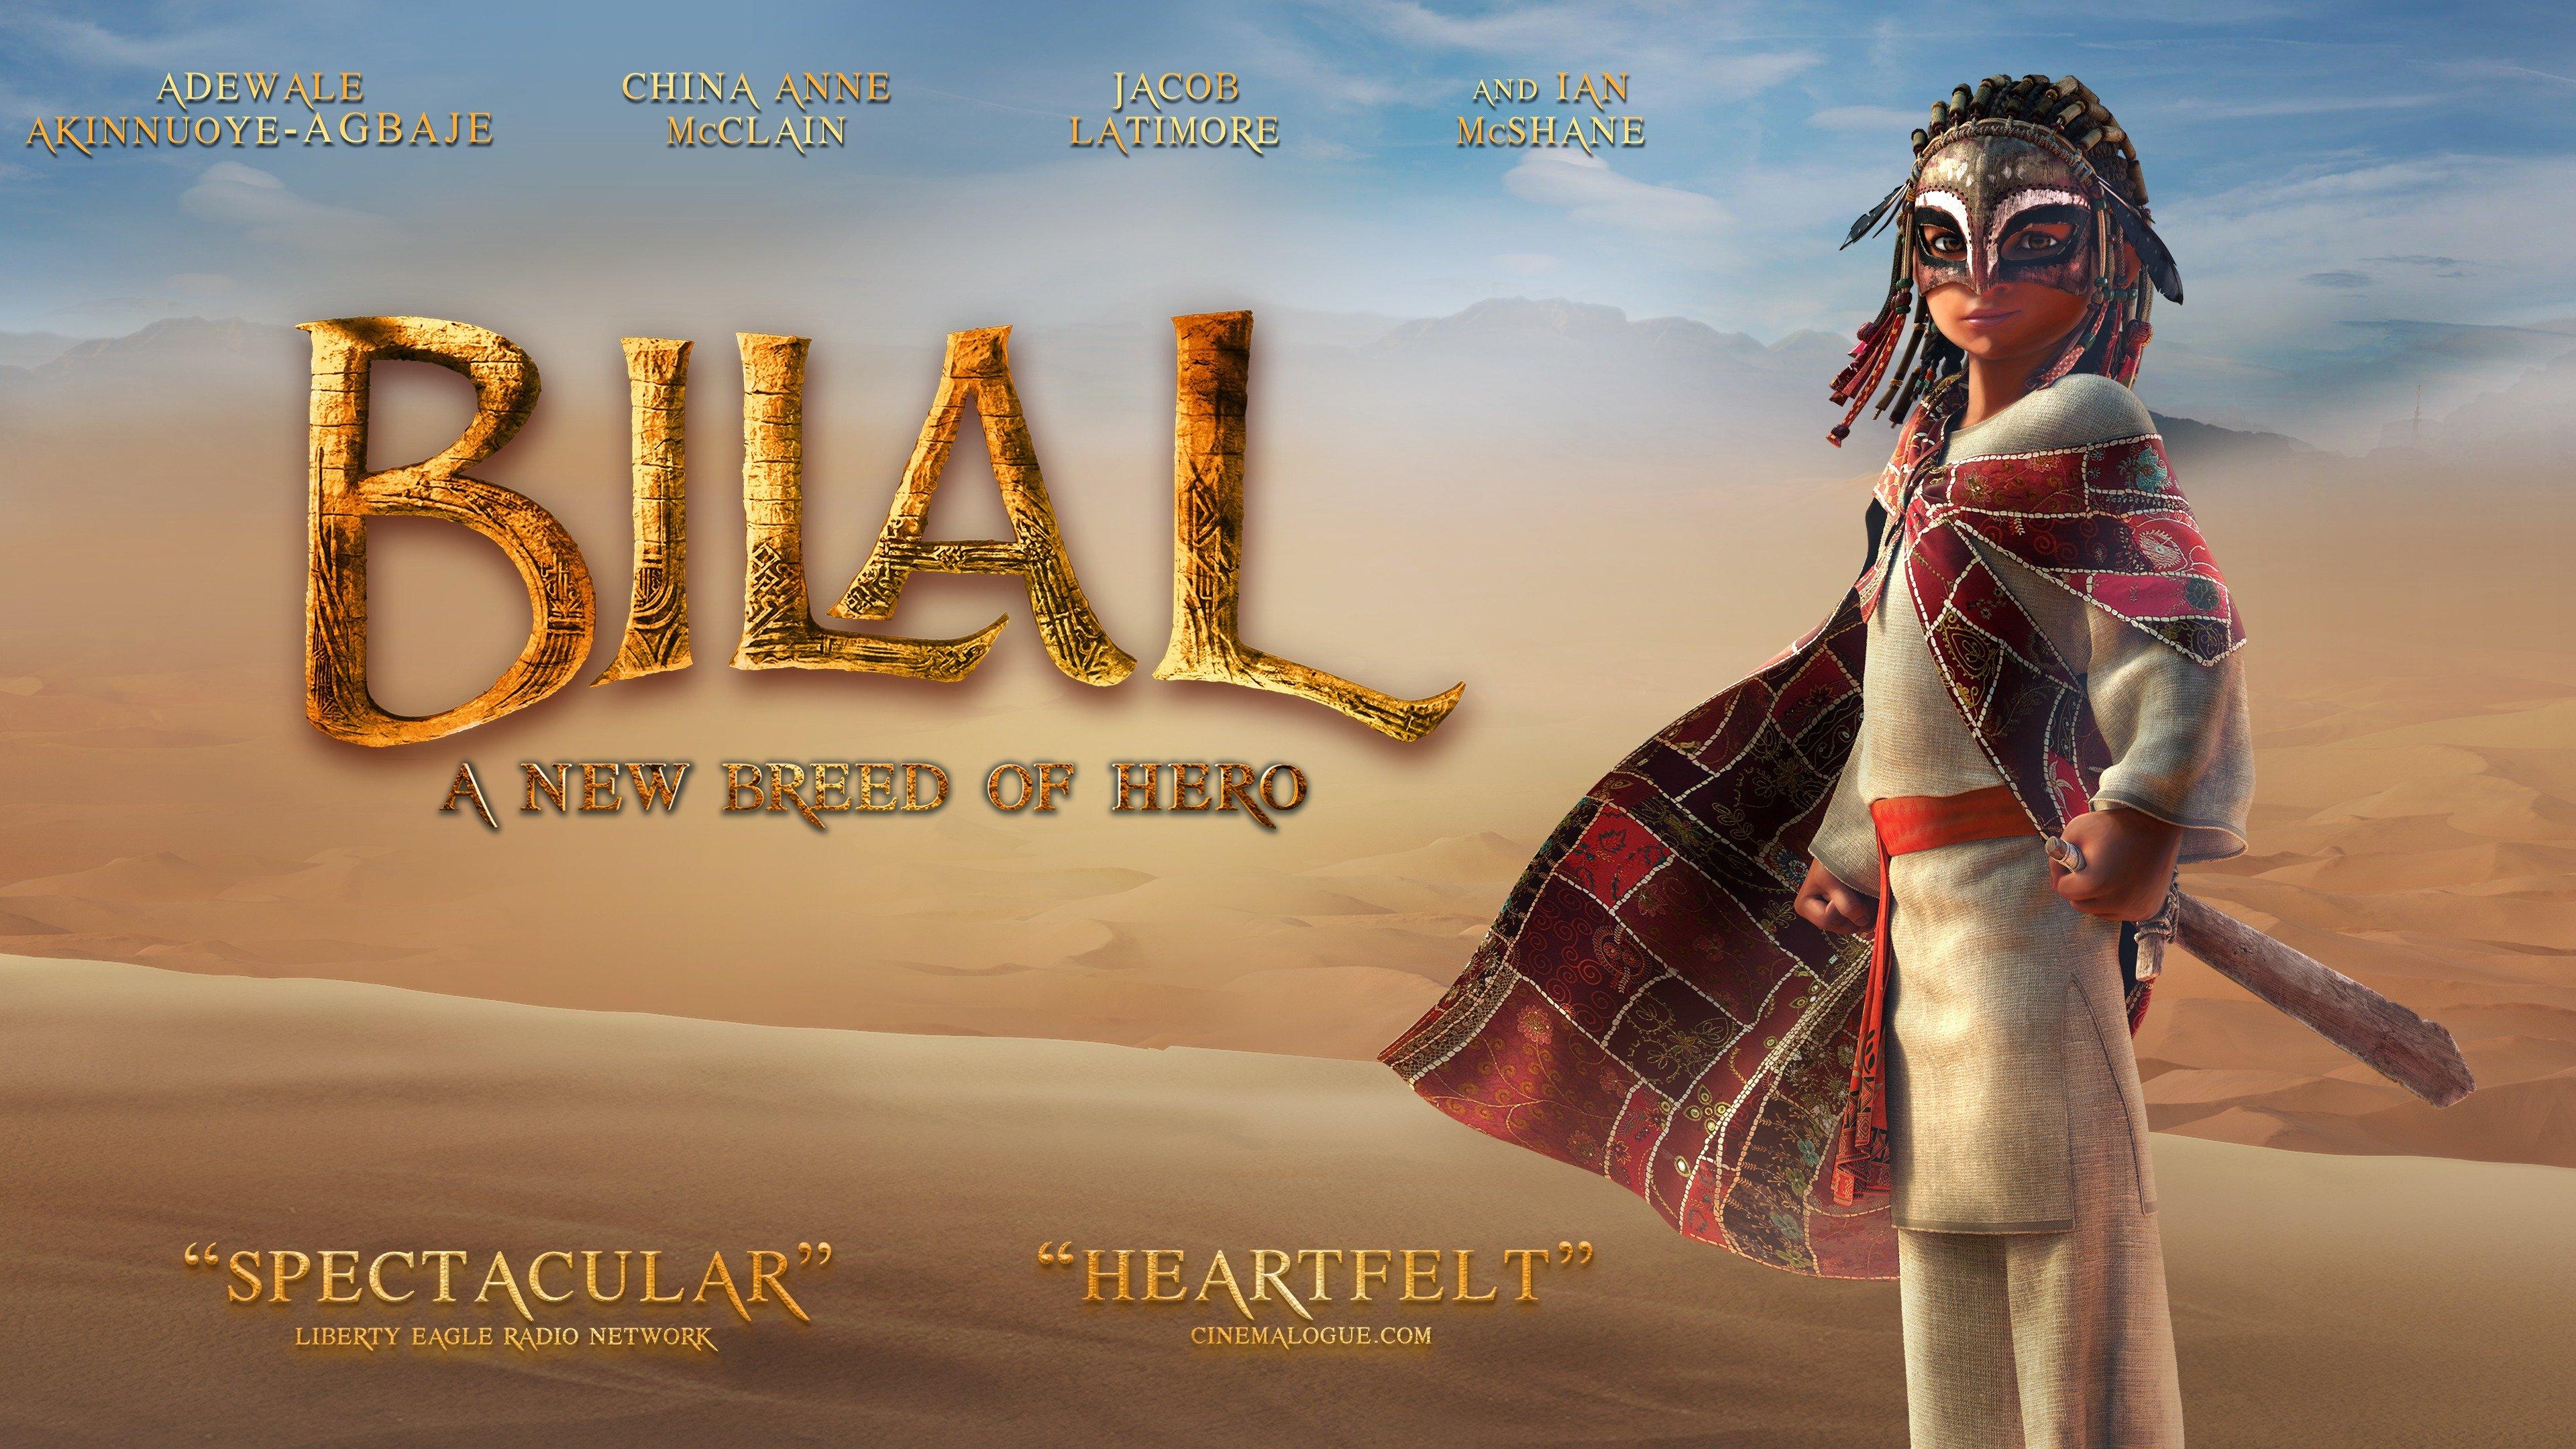 Bilal A New Breed Of Hero Movietickets